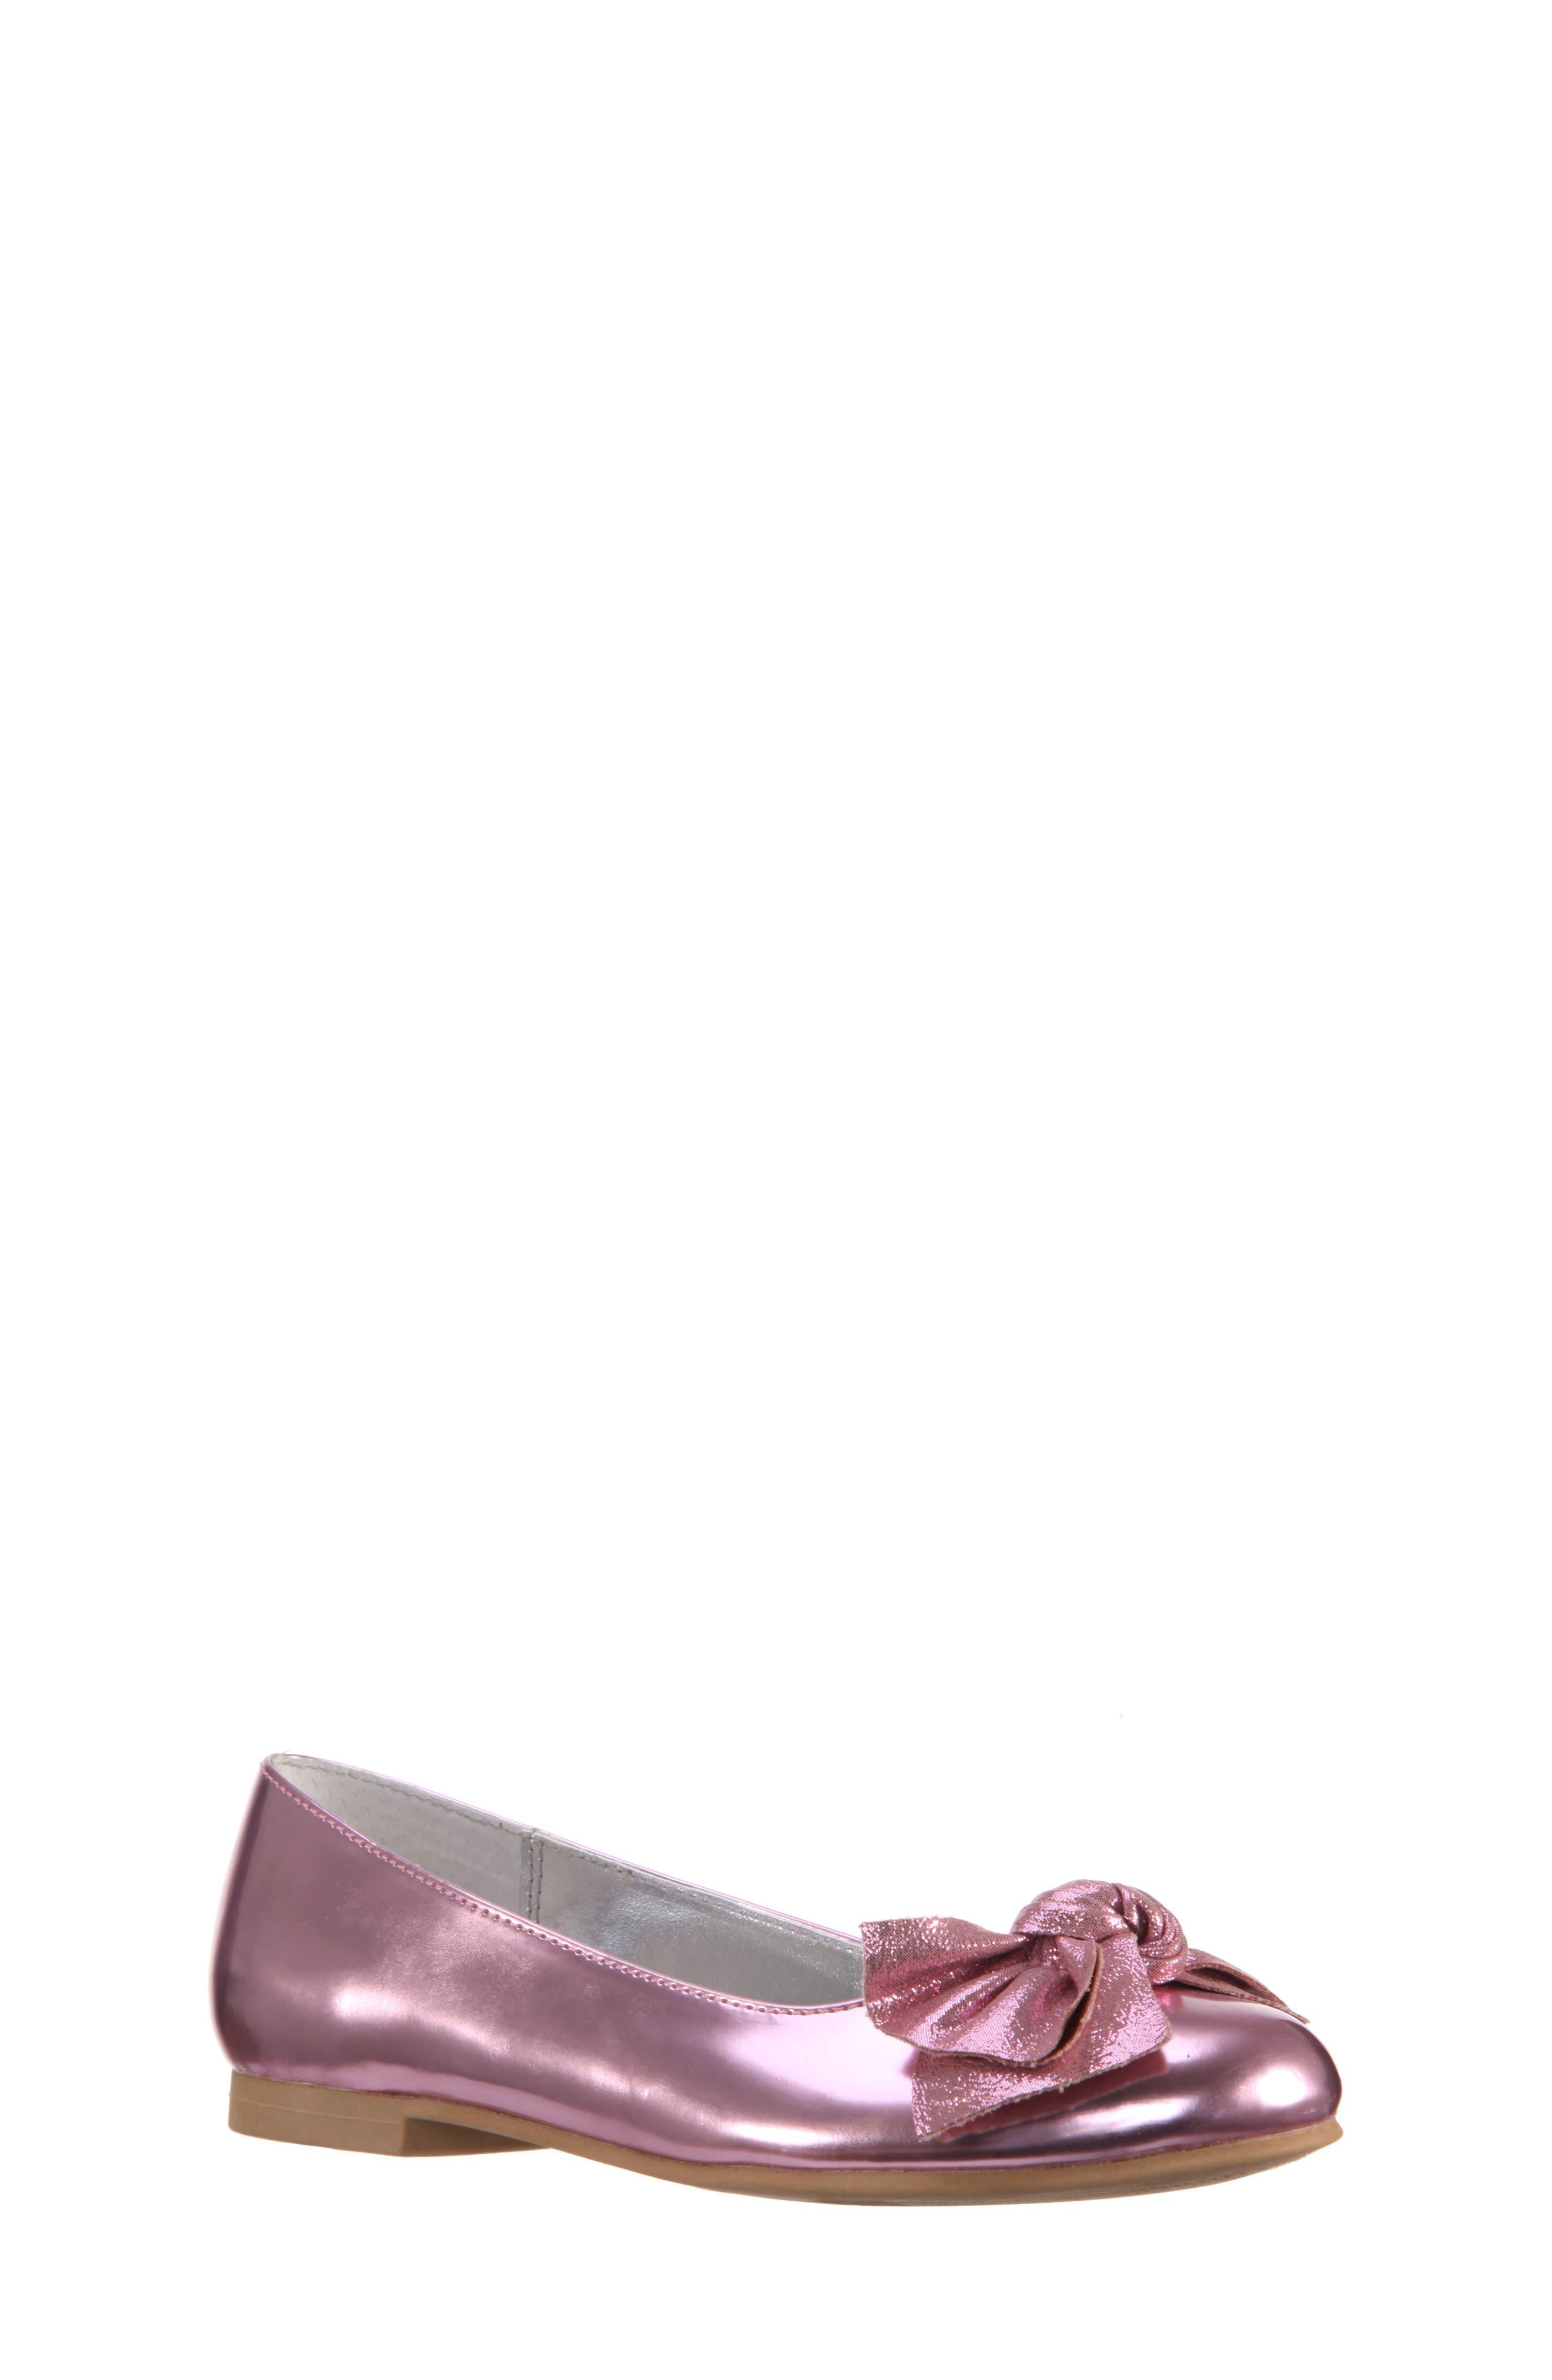 Katelyn Glitter Bow Metallic Ballet Flat,                             Main thumbnail 1, color,                             Pink Mirror Metallic